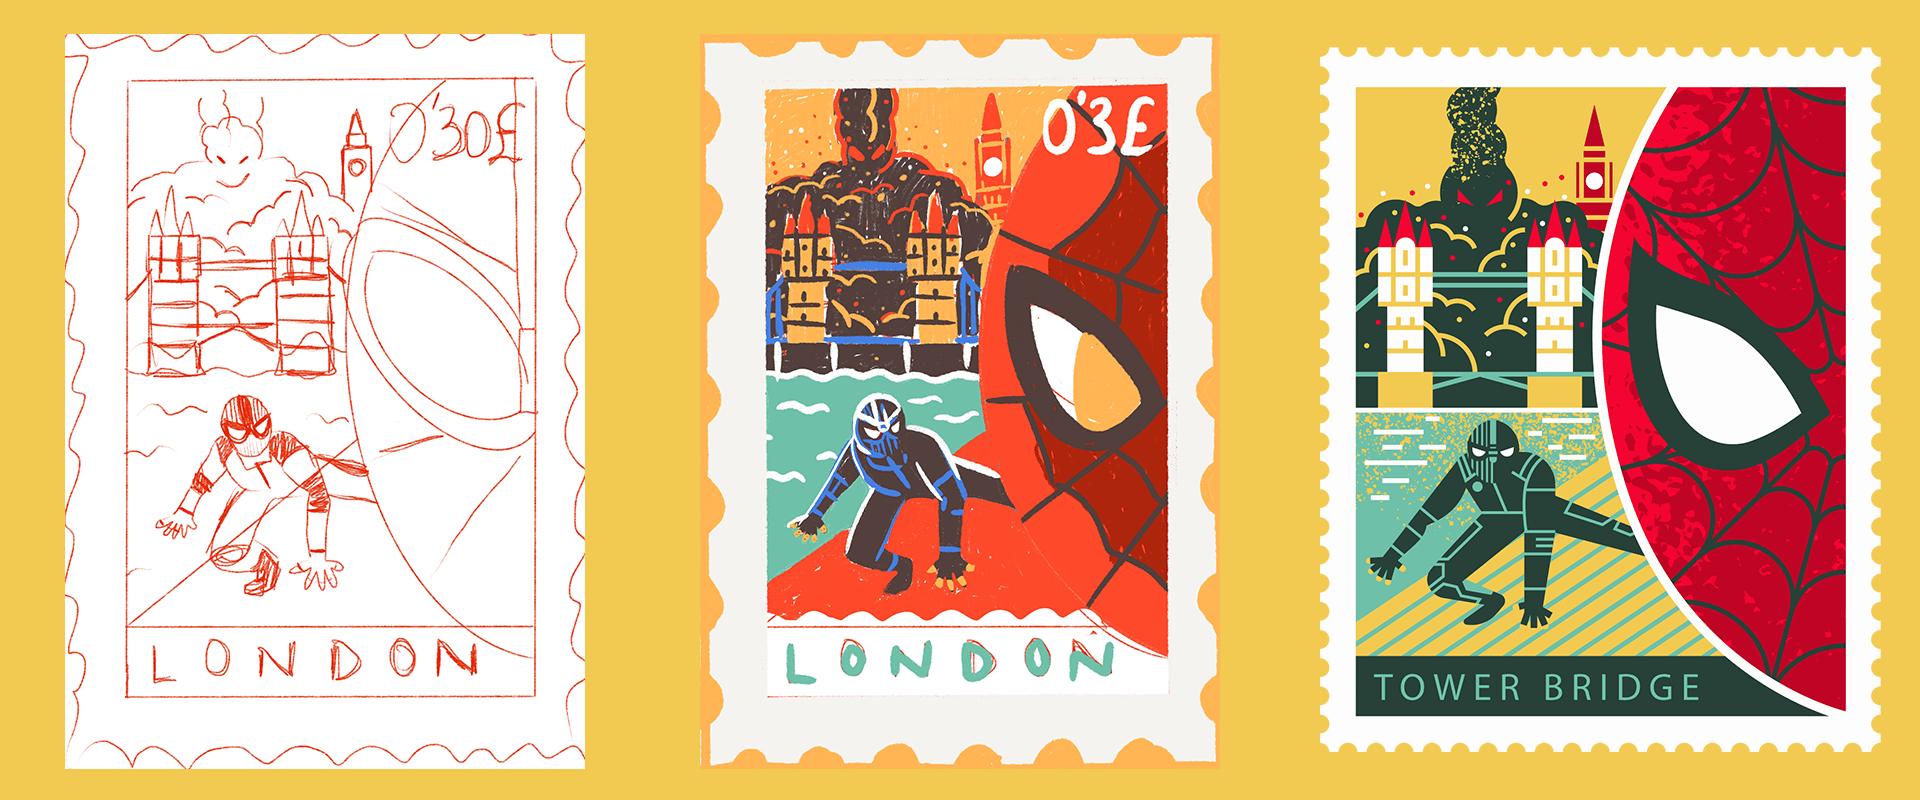 Spider-Man-Far-From-Home-Alternative-Movie-Poster-design